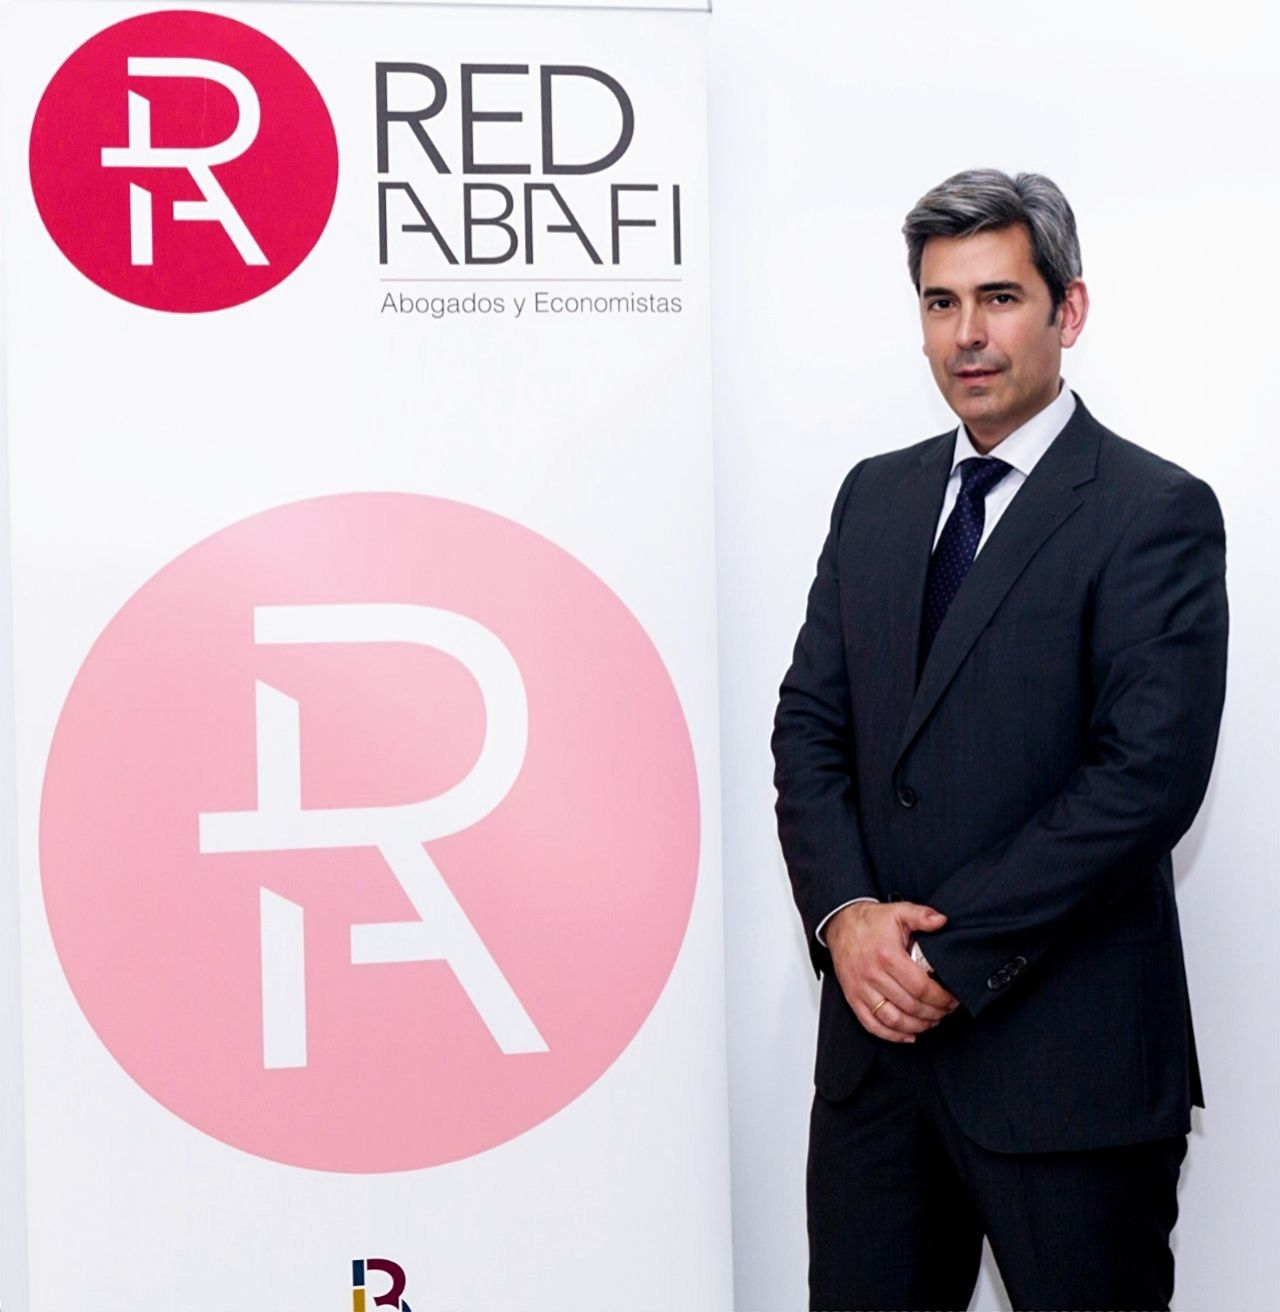 Foto de Rafael López, letrado de RED ABAFI en Córdoba